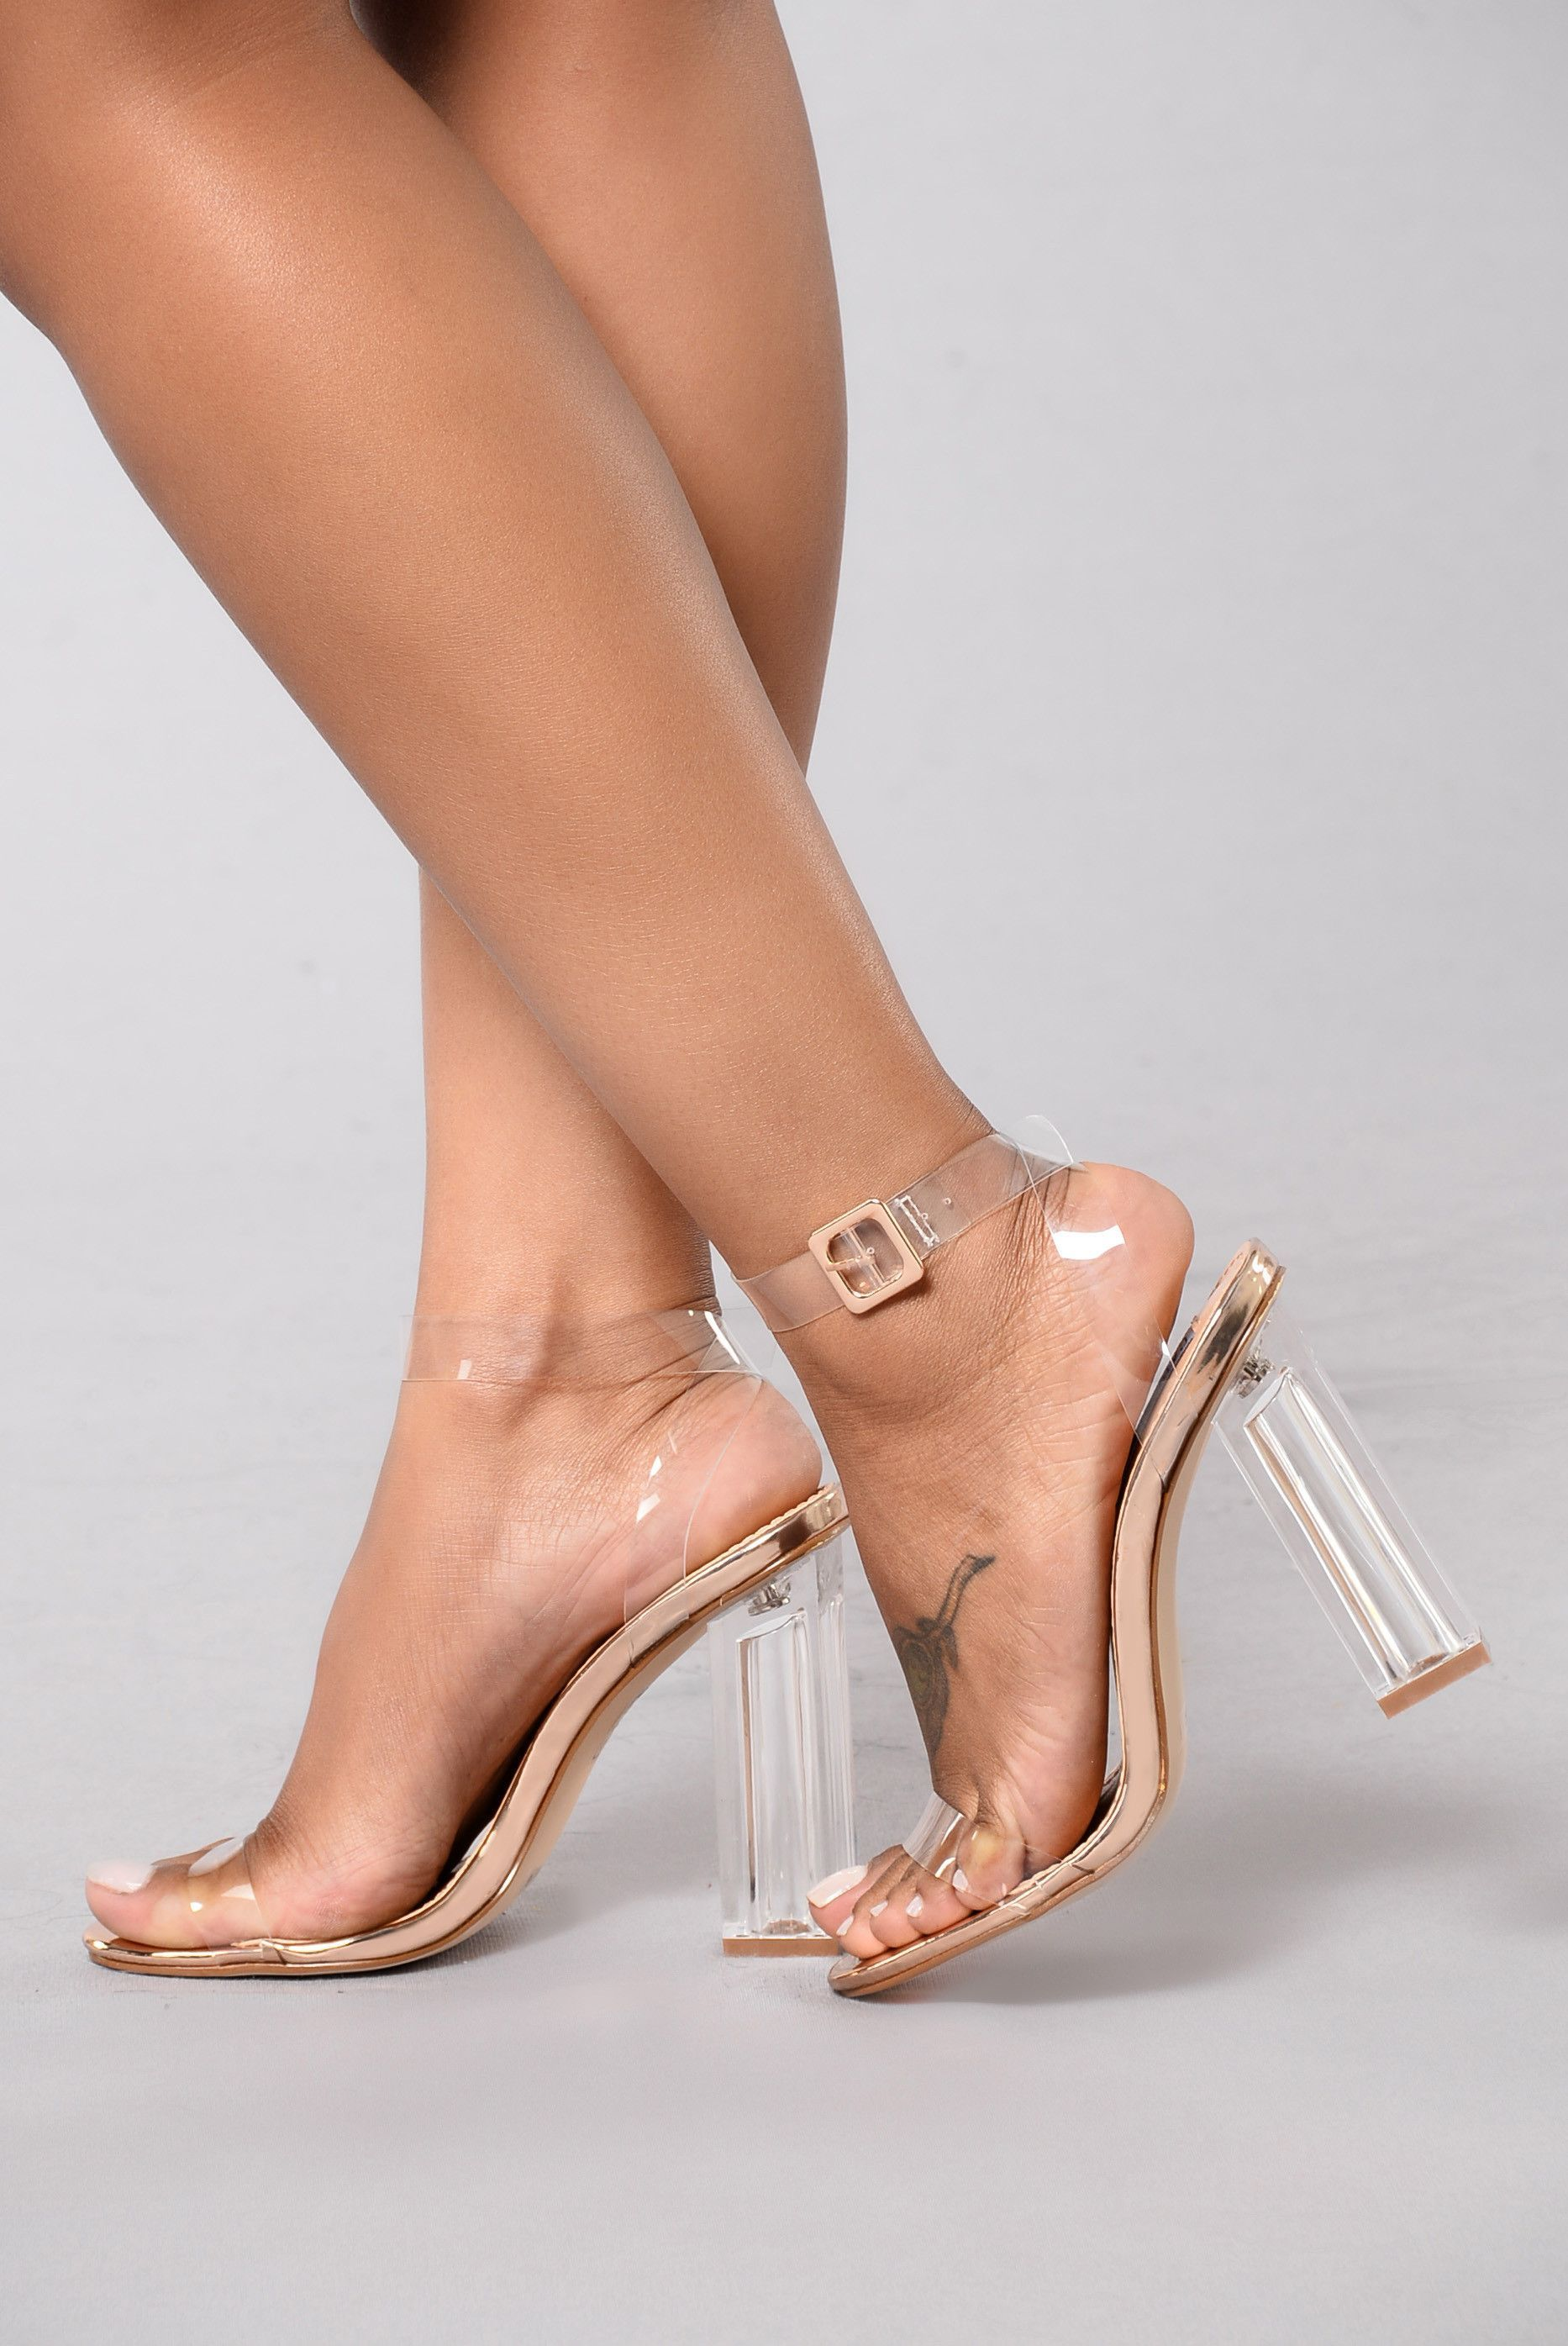 The Glass Slipper Rose Gold   Heels, Prom heels, Rose gold